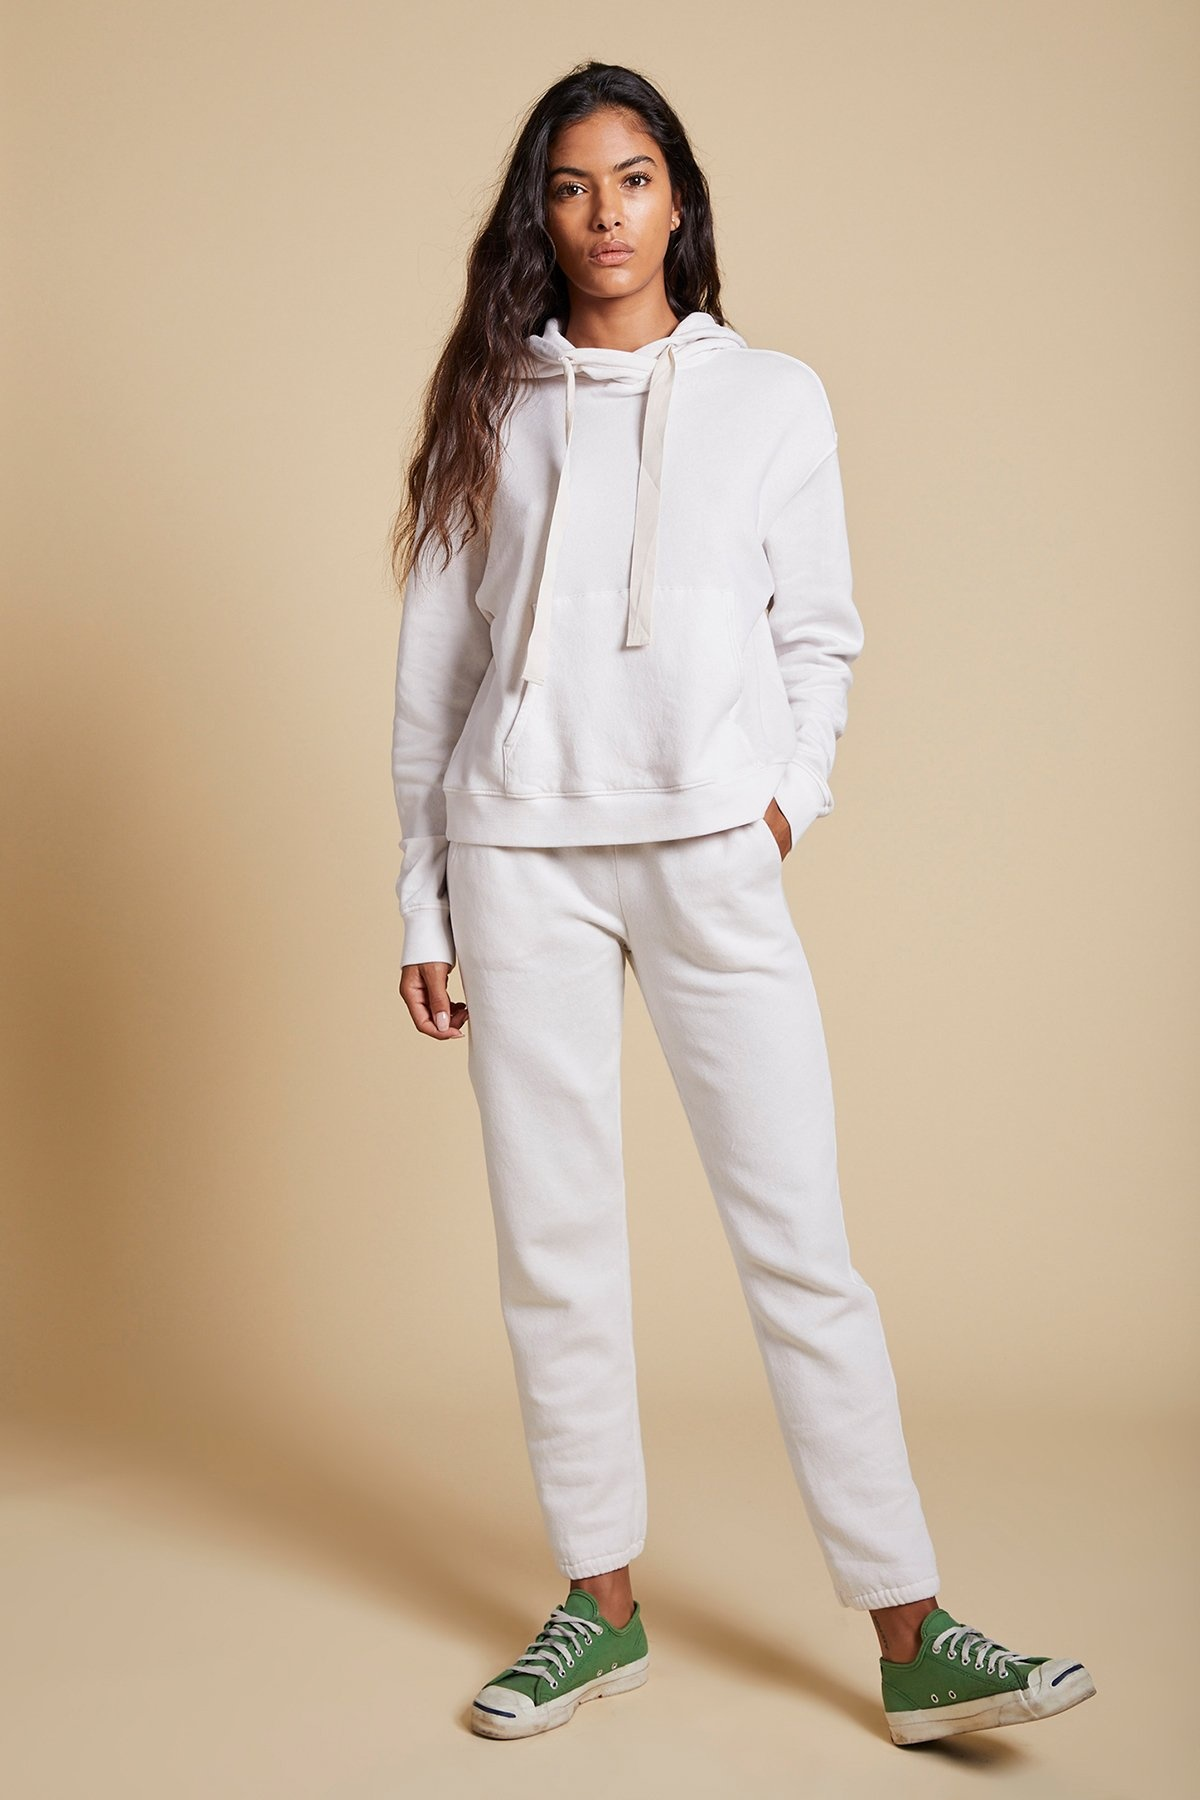 Velvet Cotton Fleece Ojai Hoodie